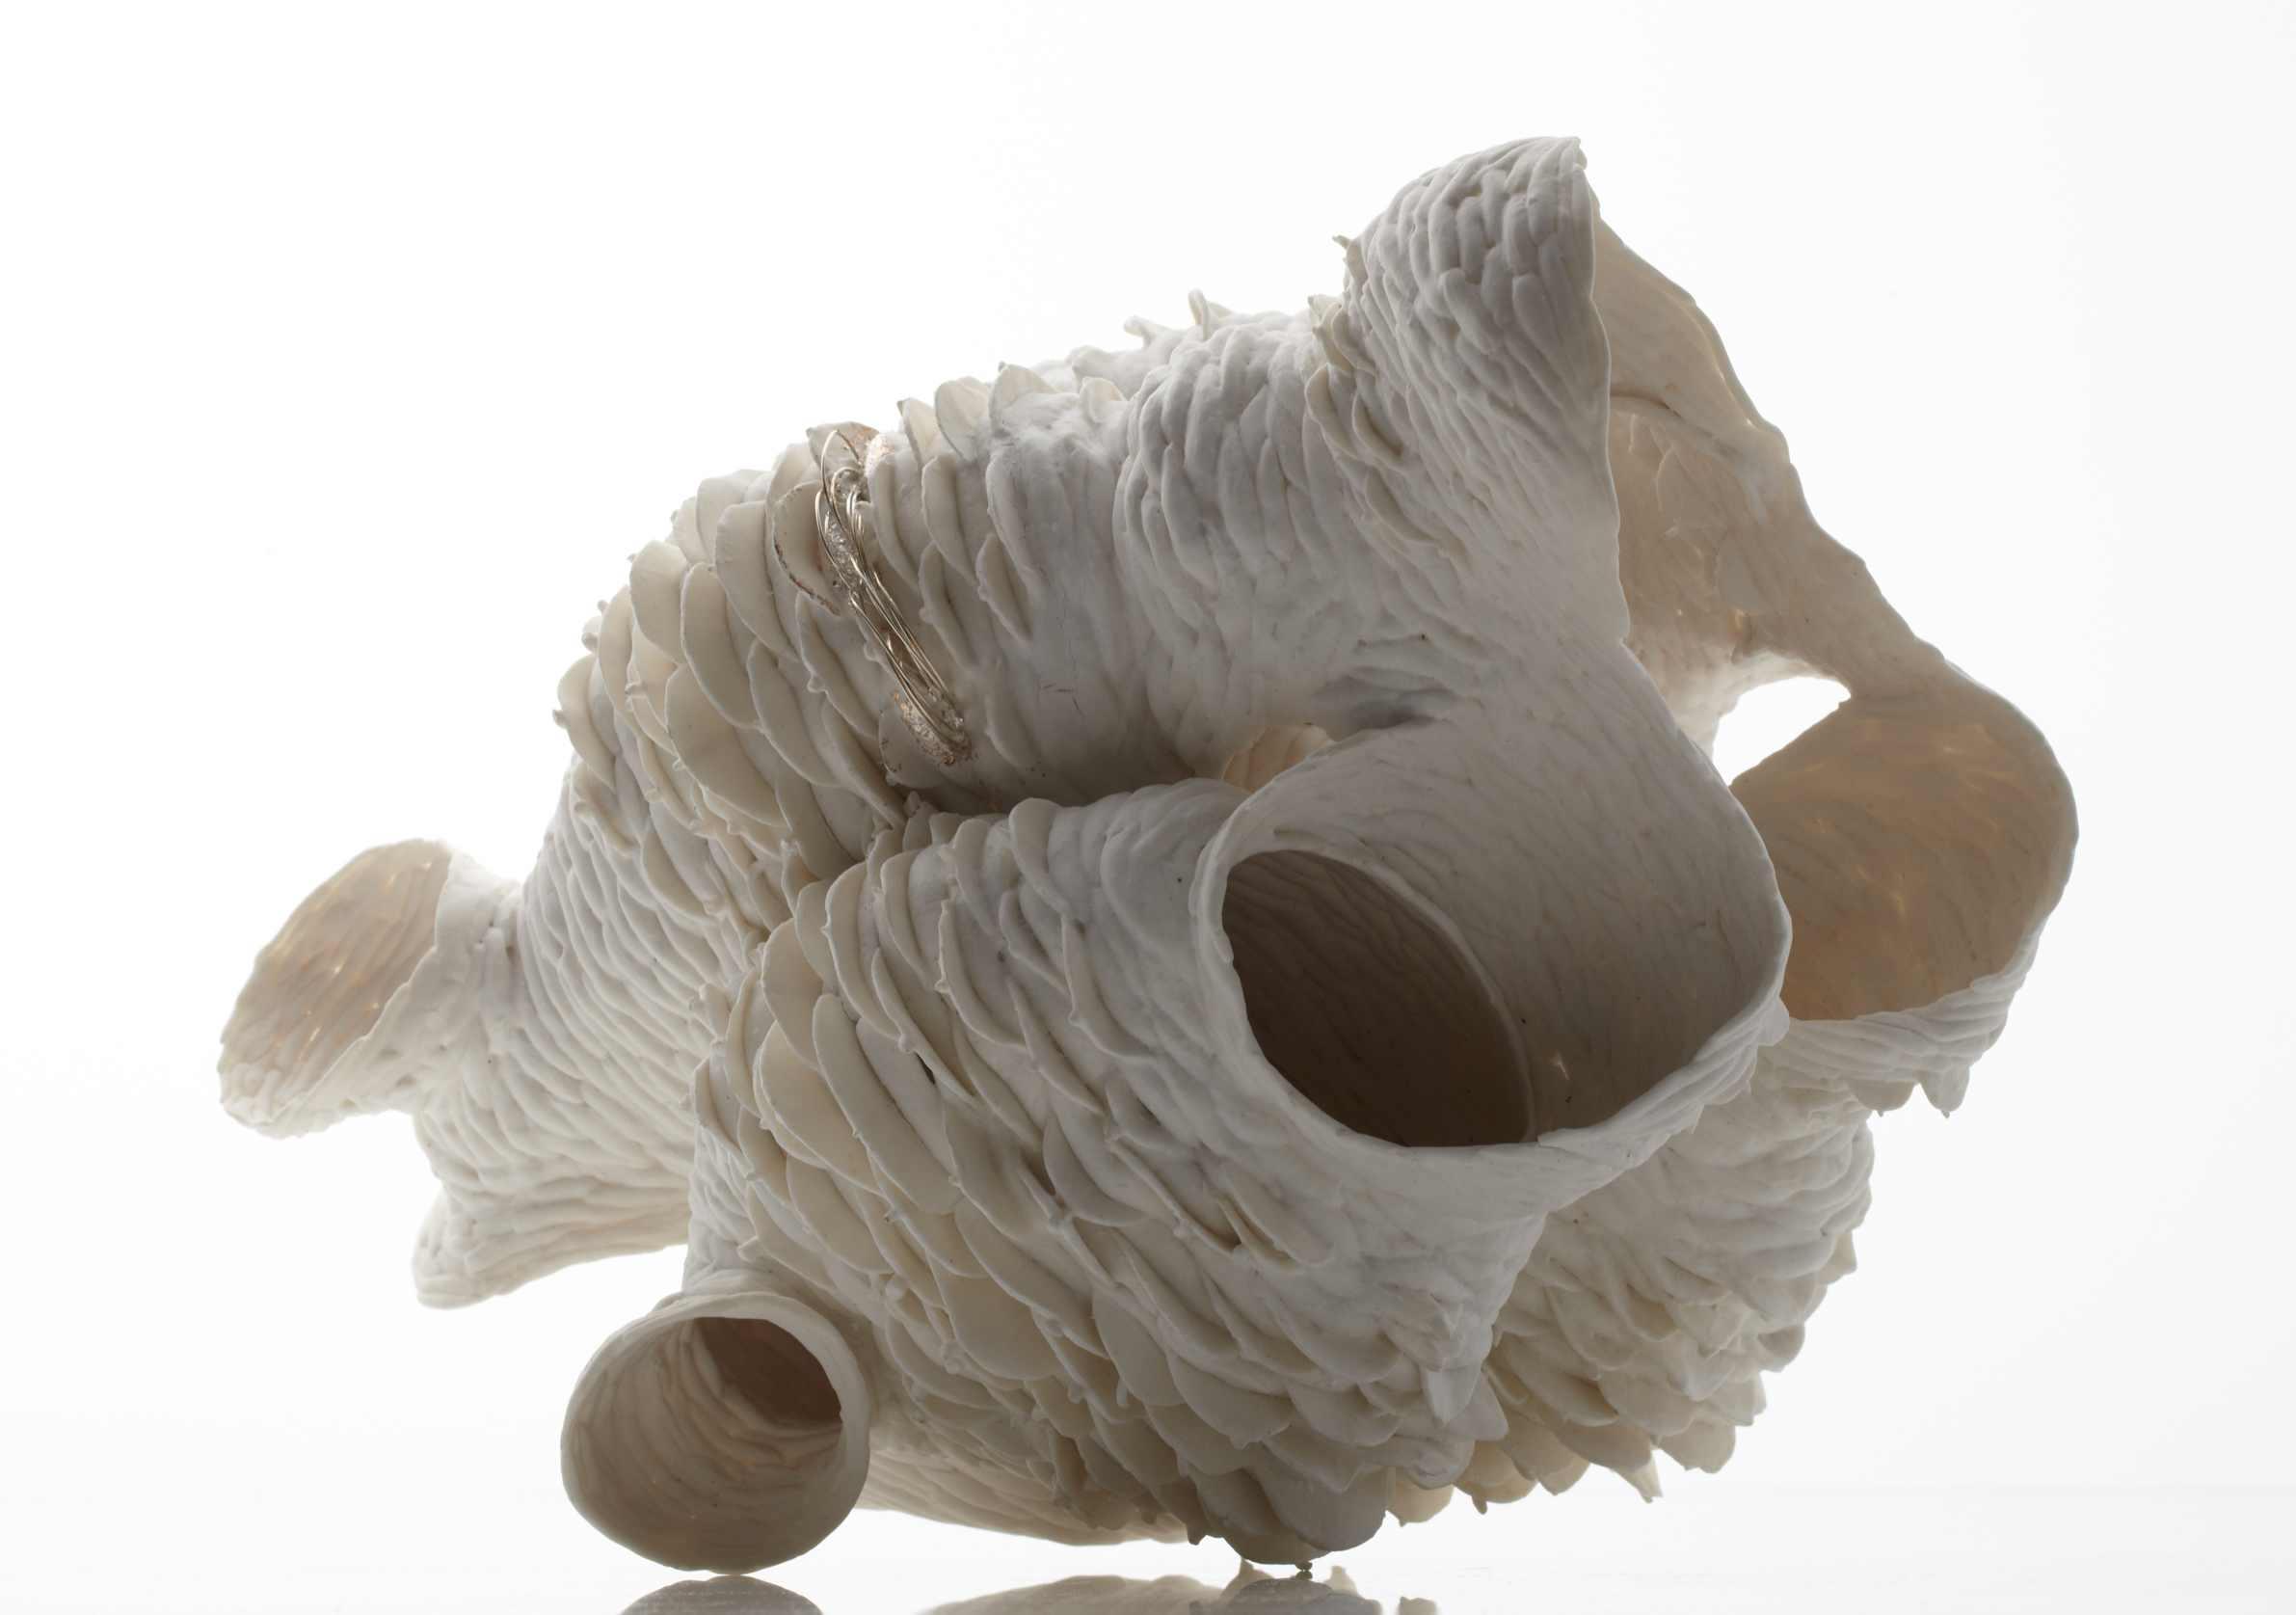 Nuala O'Donovan, Pinecone, Heart high fired unglazed porcelain, 35 x 30 x 28cm